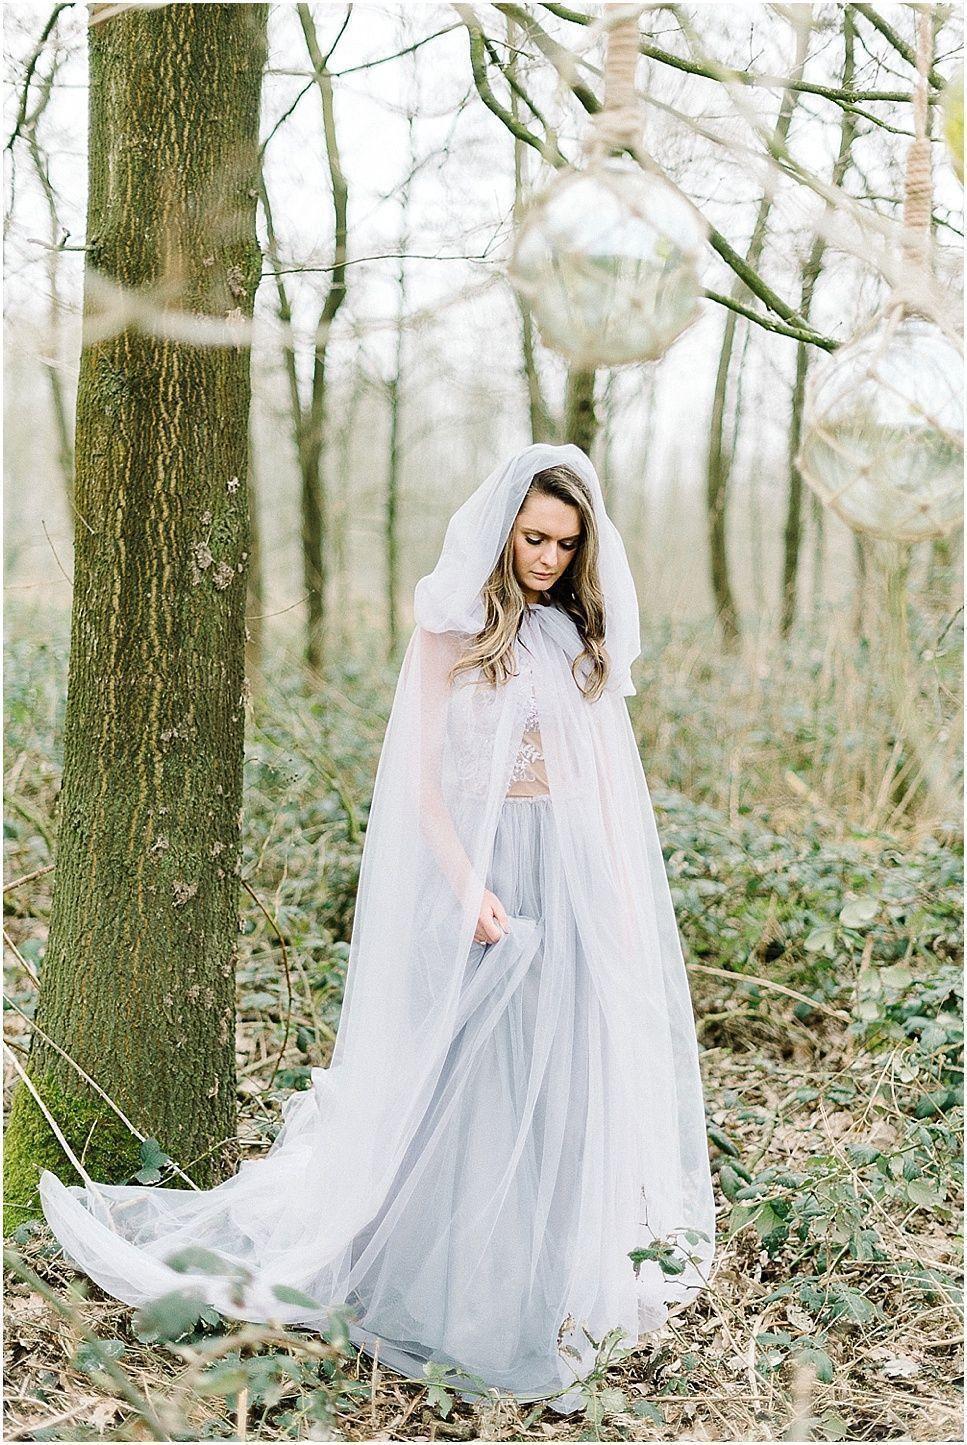 5 Tips For Elegant Nerdy Themes For Your Wedding like wearing elvish ...